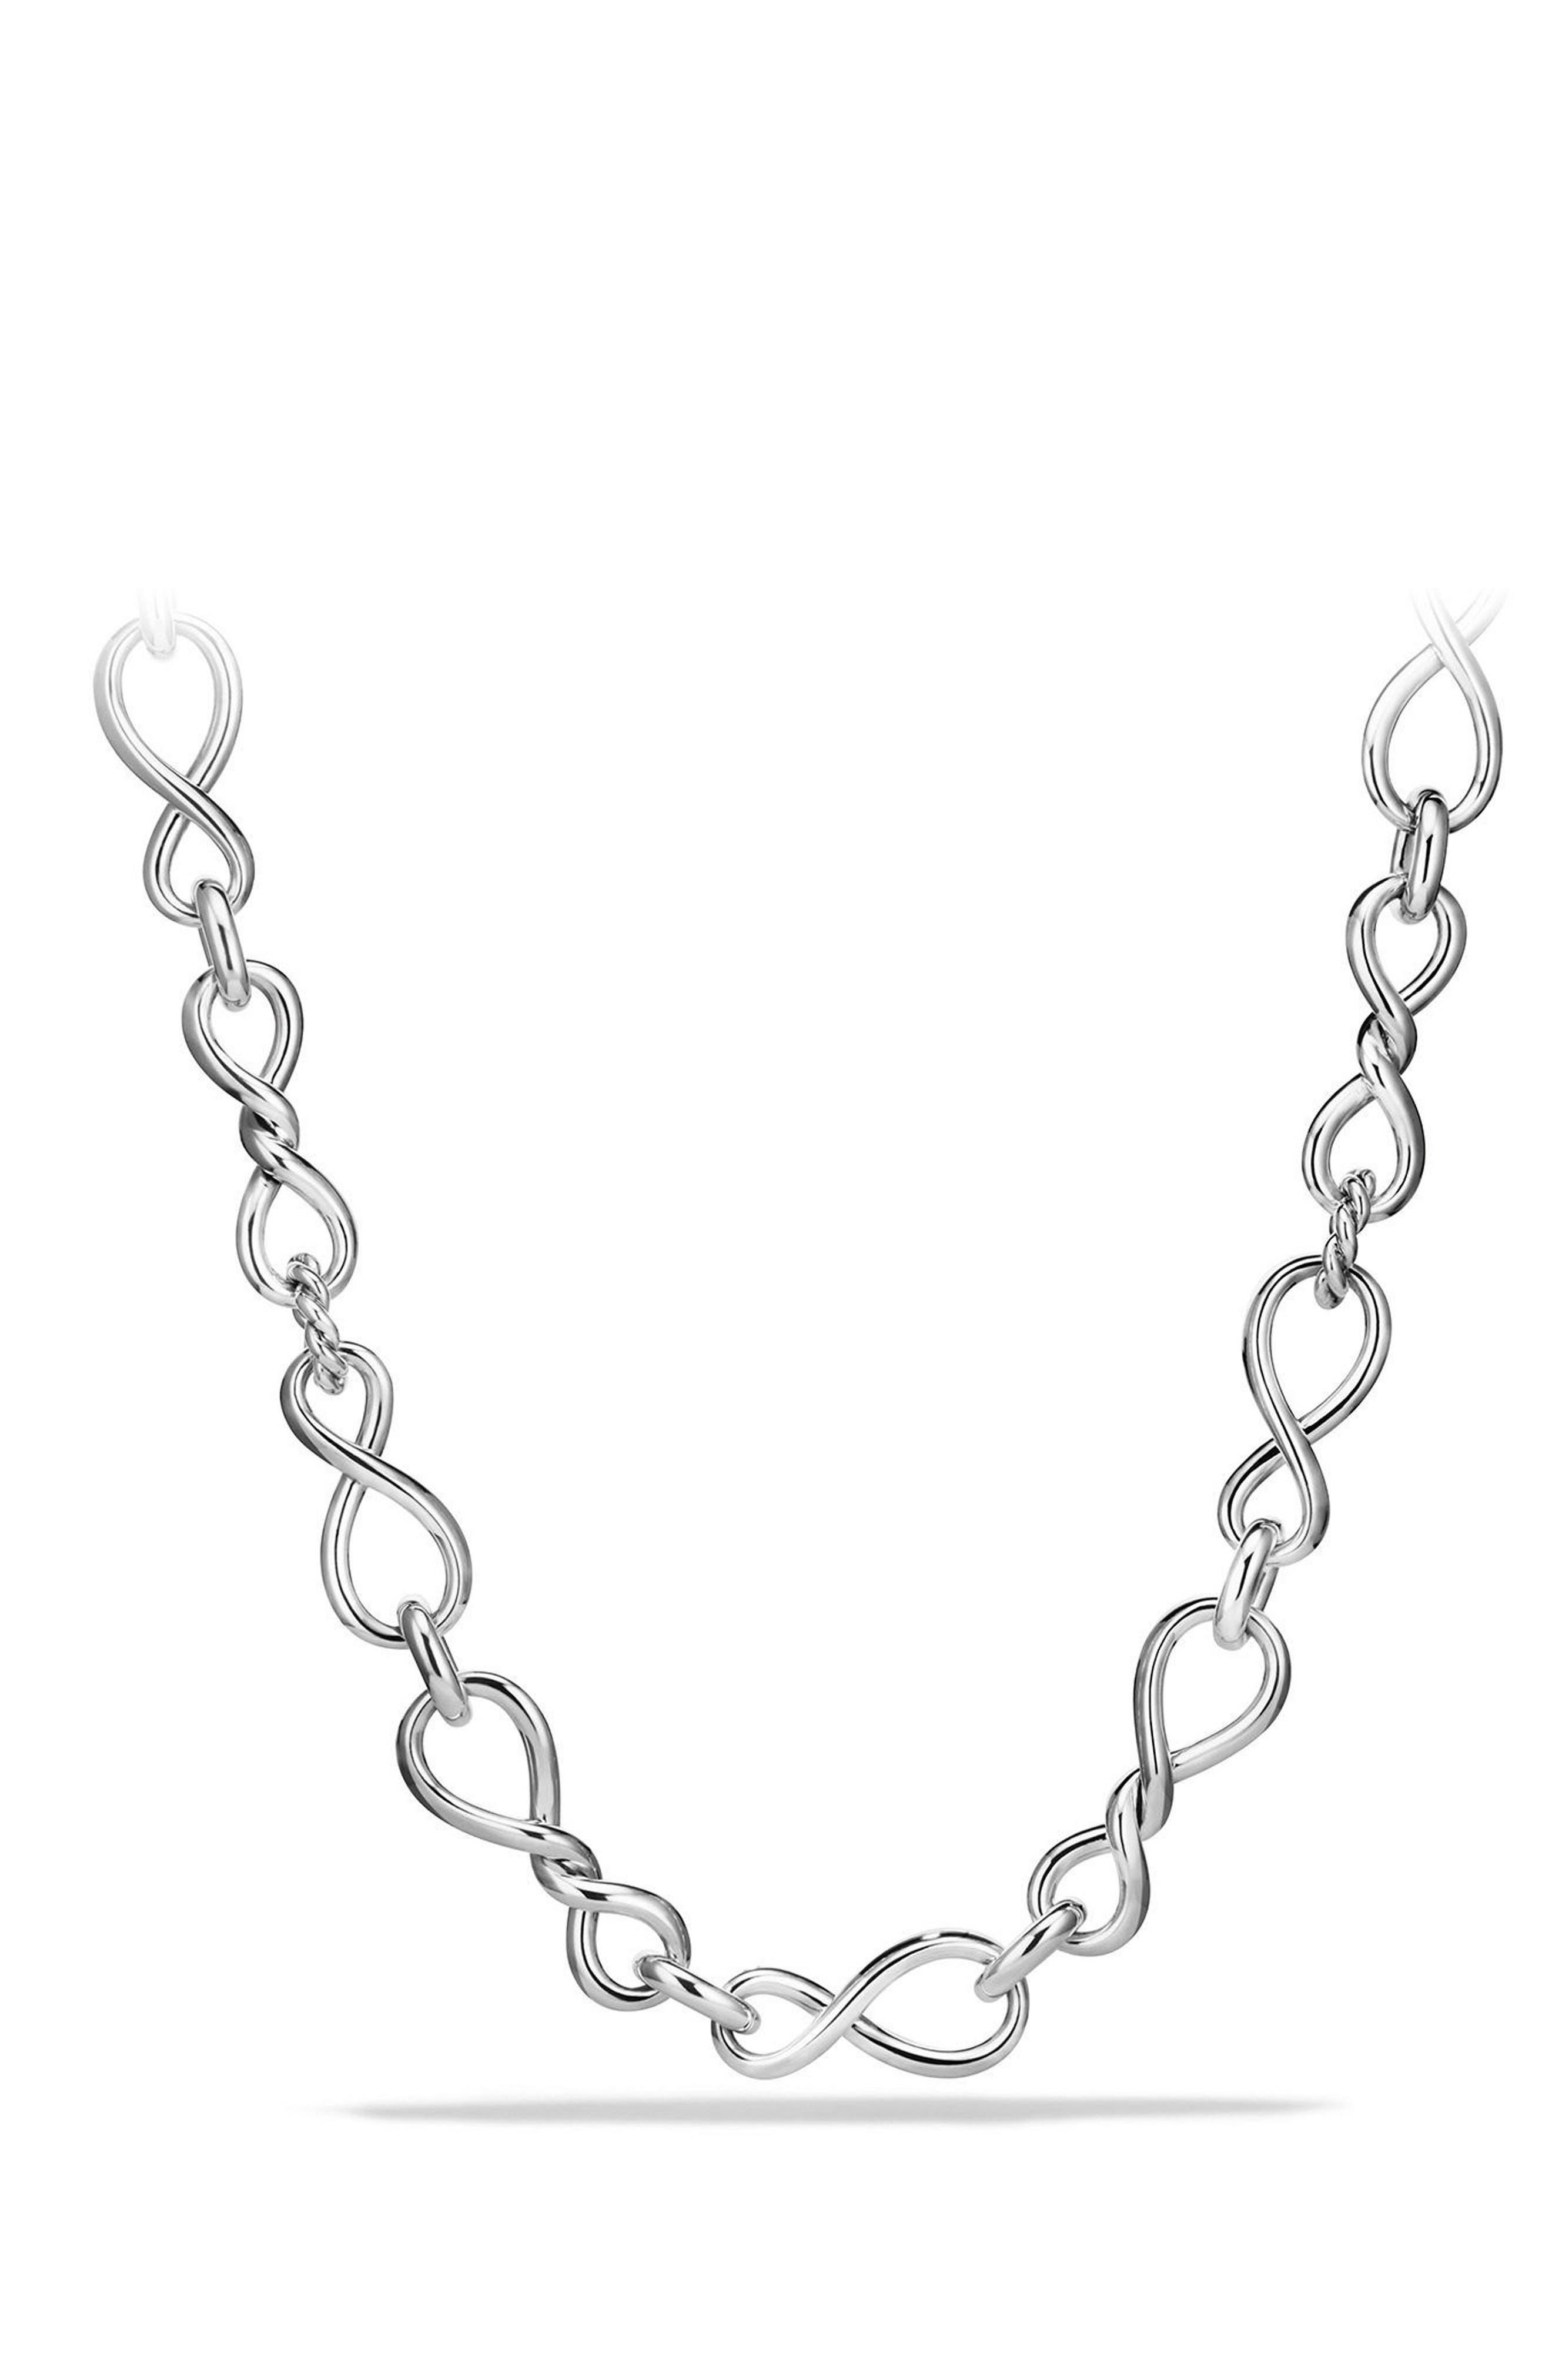 Main Image - David Yurman Continuance Large Chain Necklace